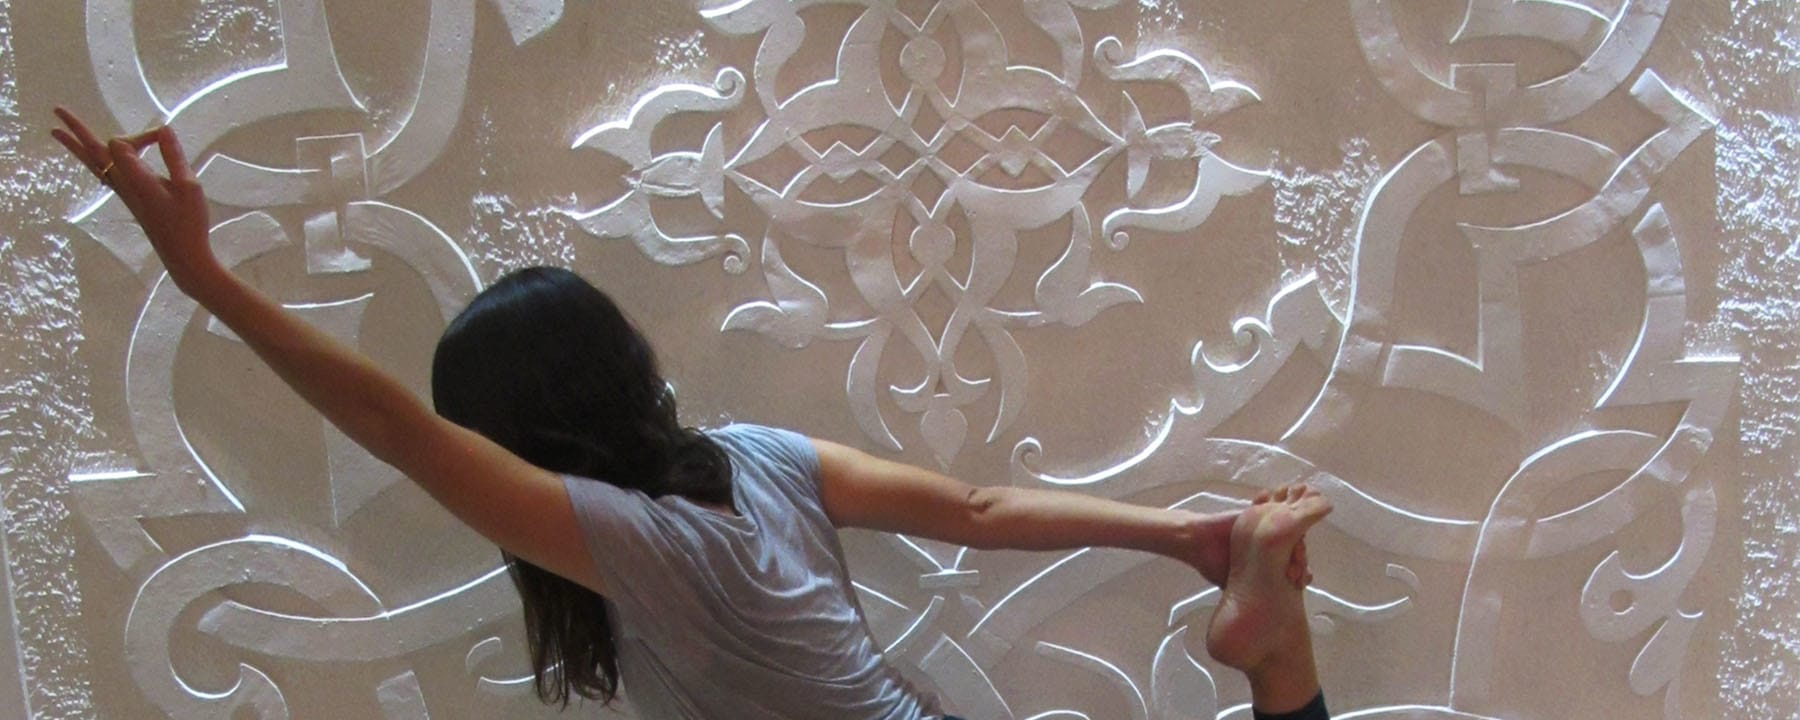 Marrakech Yoga Dancing Shiva_Source NOSADE